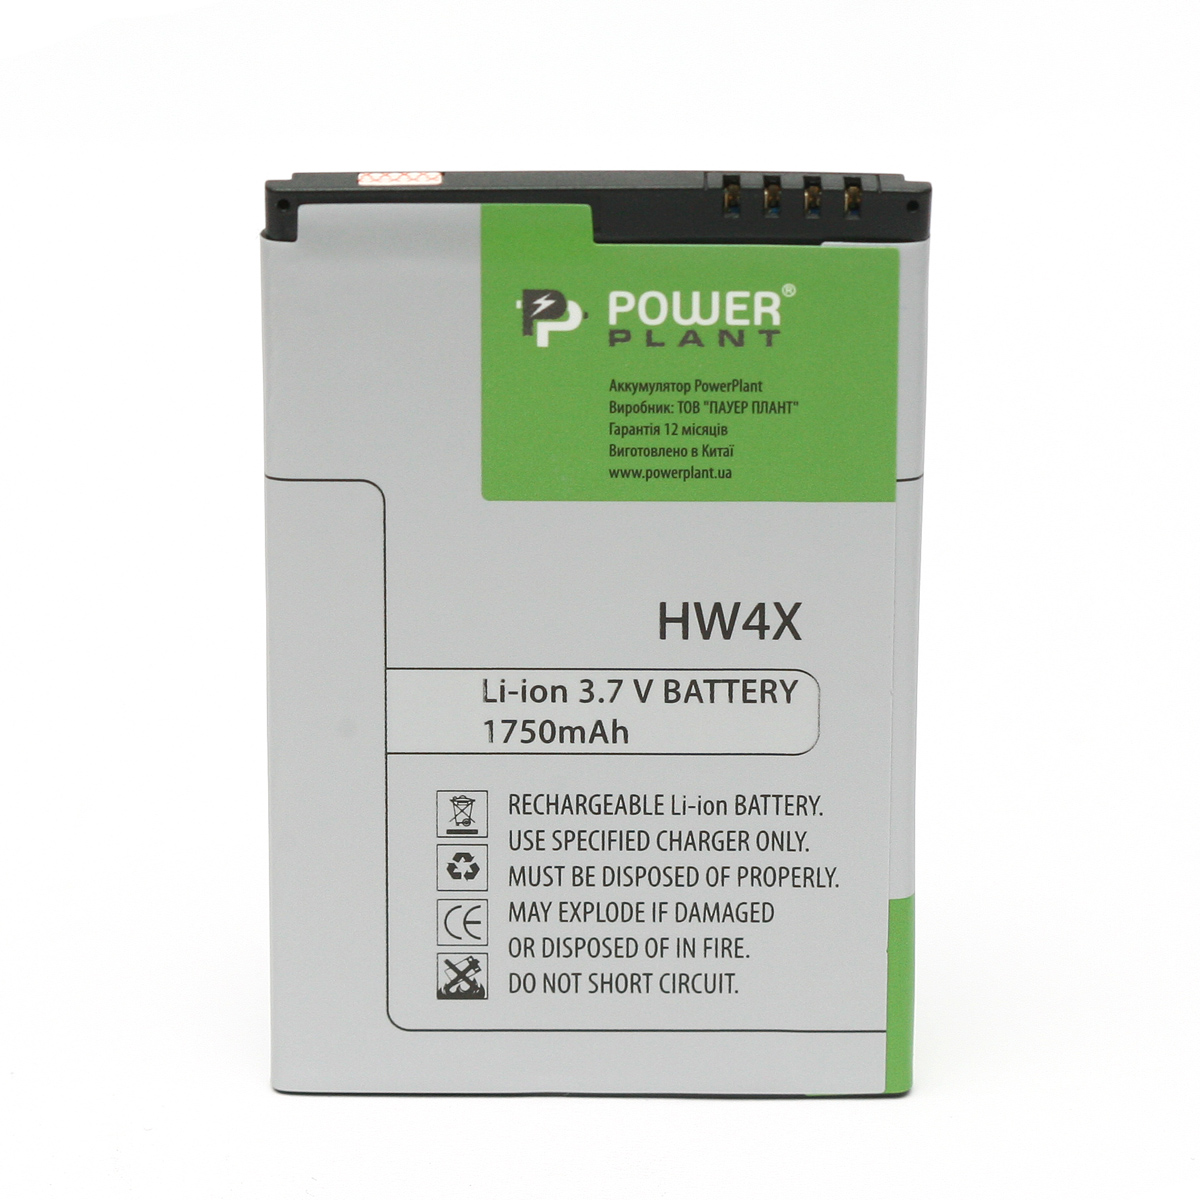 Купить Аккумулятор PowerPlant Motorola ATRIX 2 (HW4X) 1750mAh